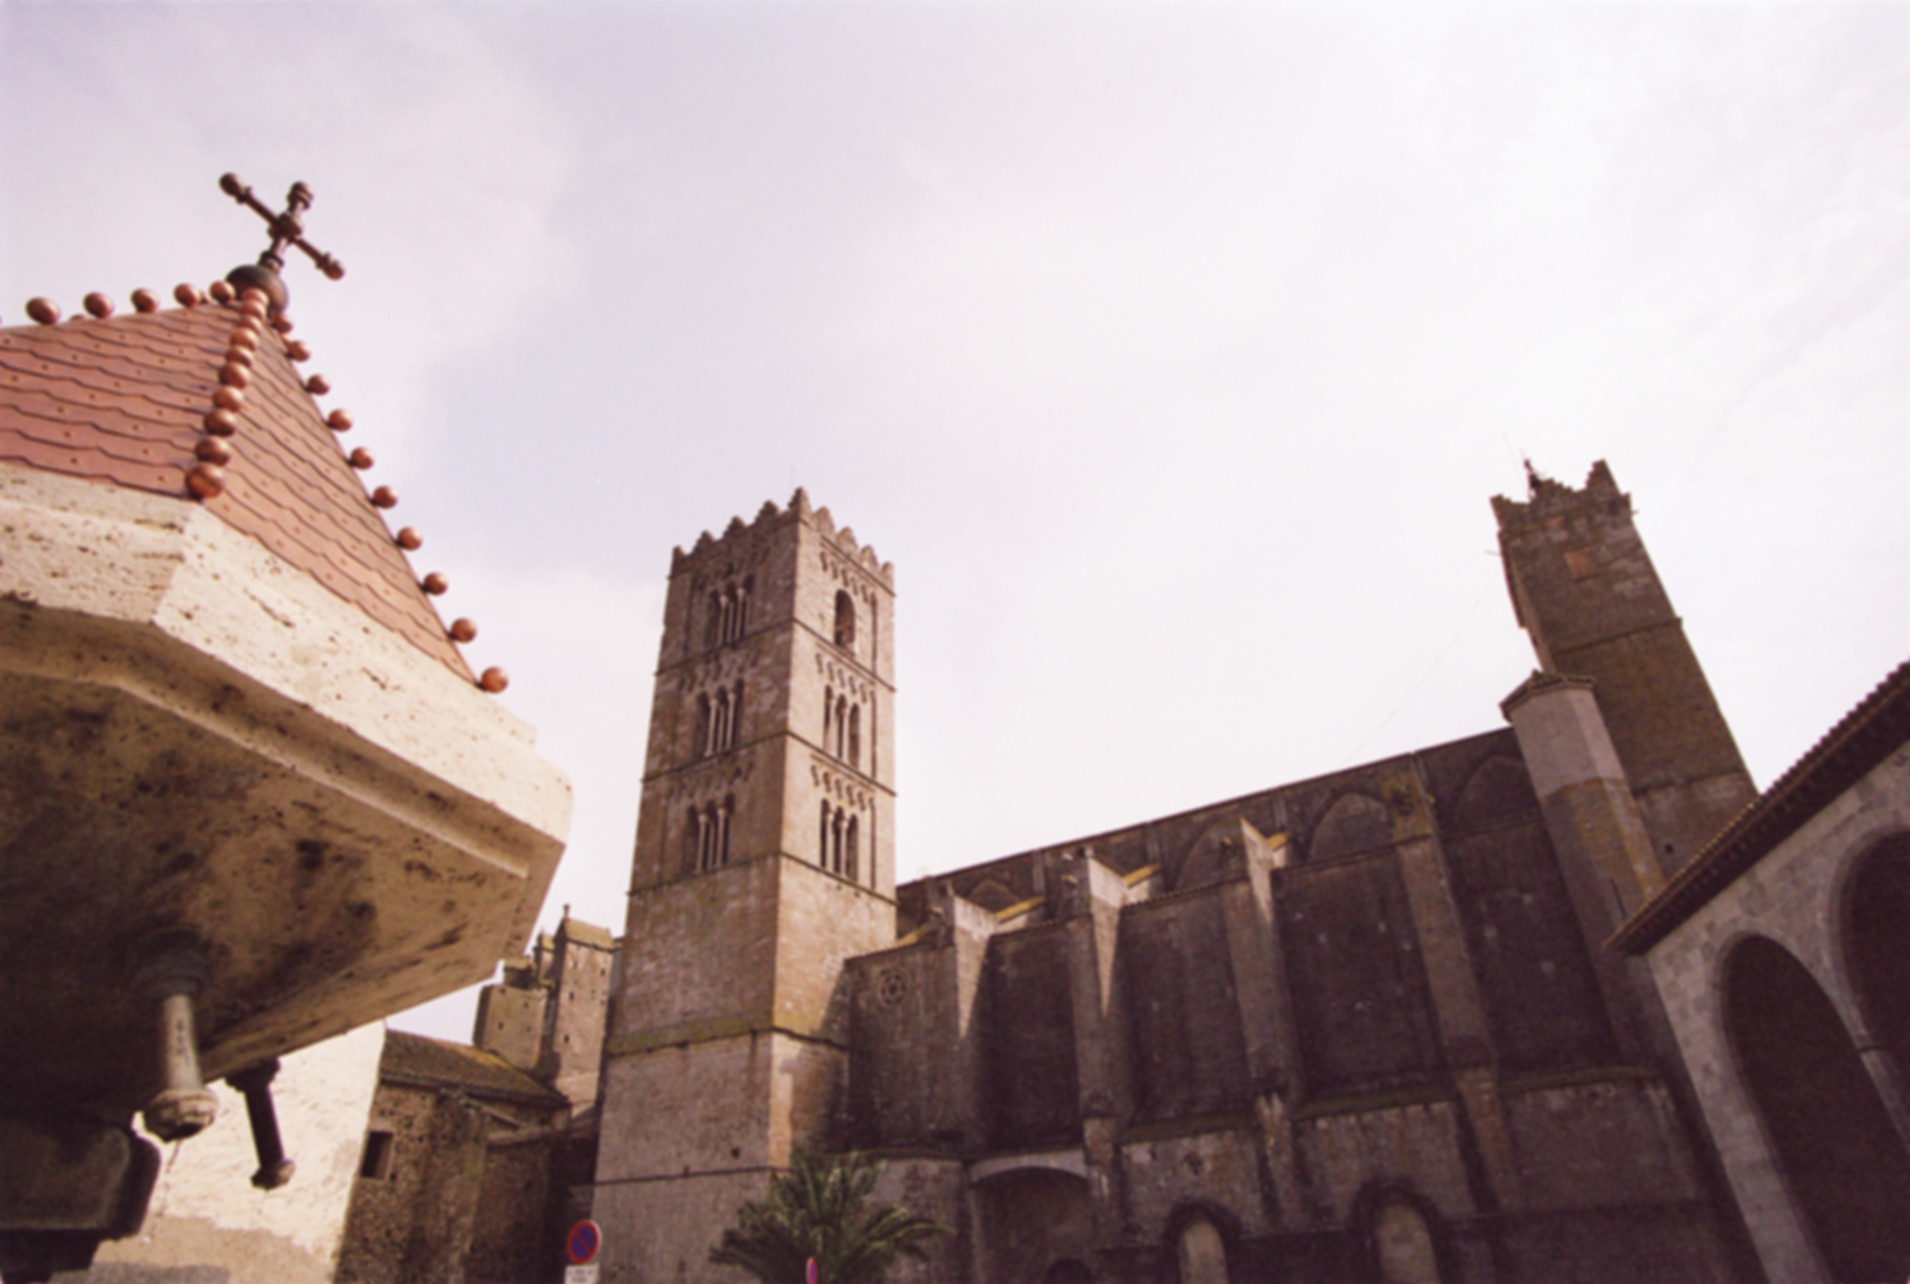 castelloempuries_8383512224_8383512224_B